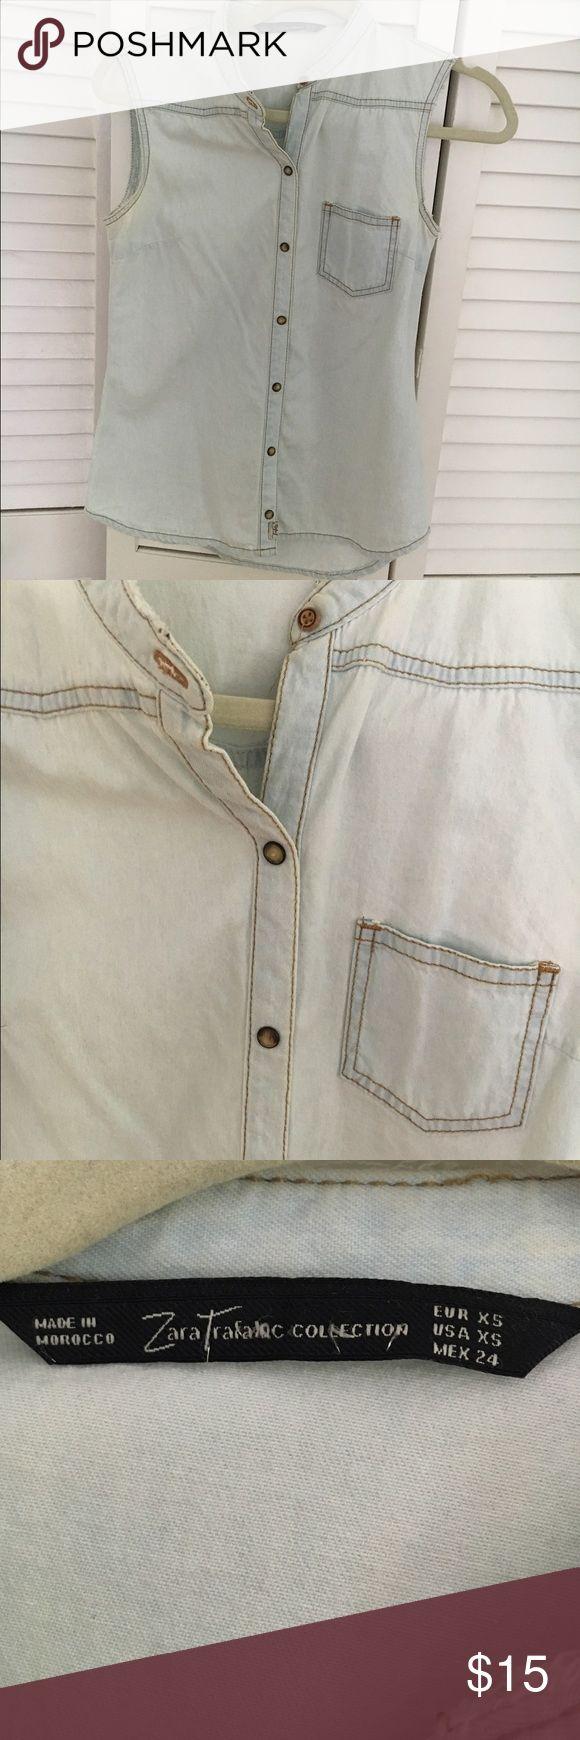 Zara sleeveless denim shirt Cute sleeveless light denim shirt. Purchased from Zara. Worn lightly. Really cute worn buttoned or unbuttoned over a dress or tank. Zara Tops Button Down Shirts